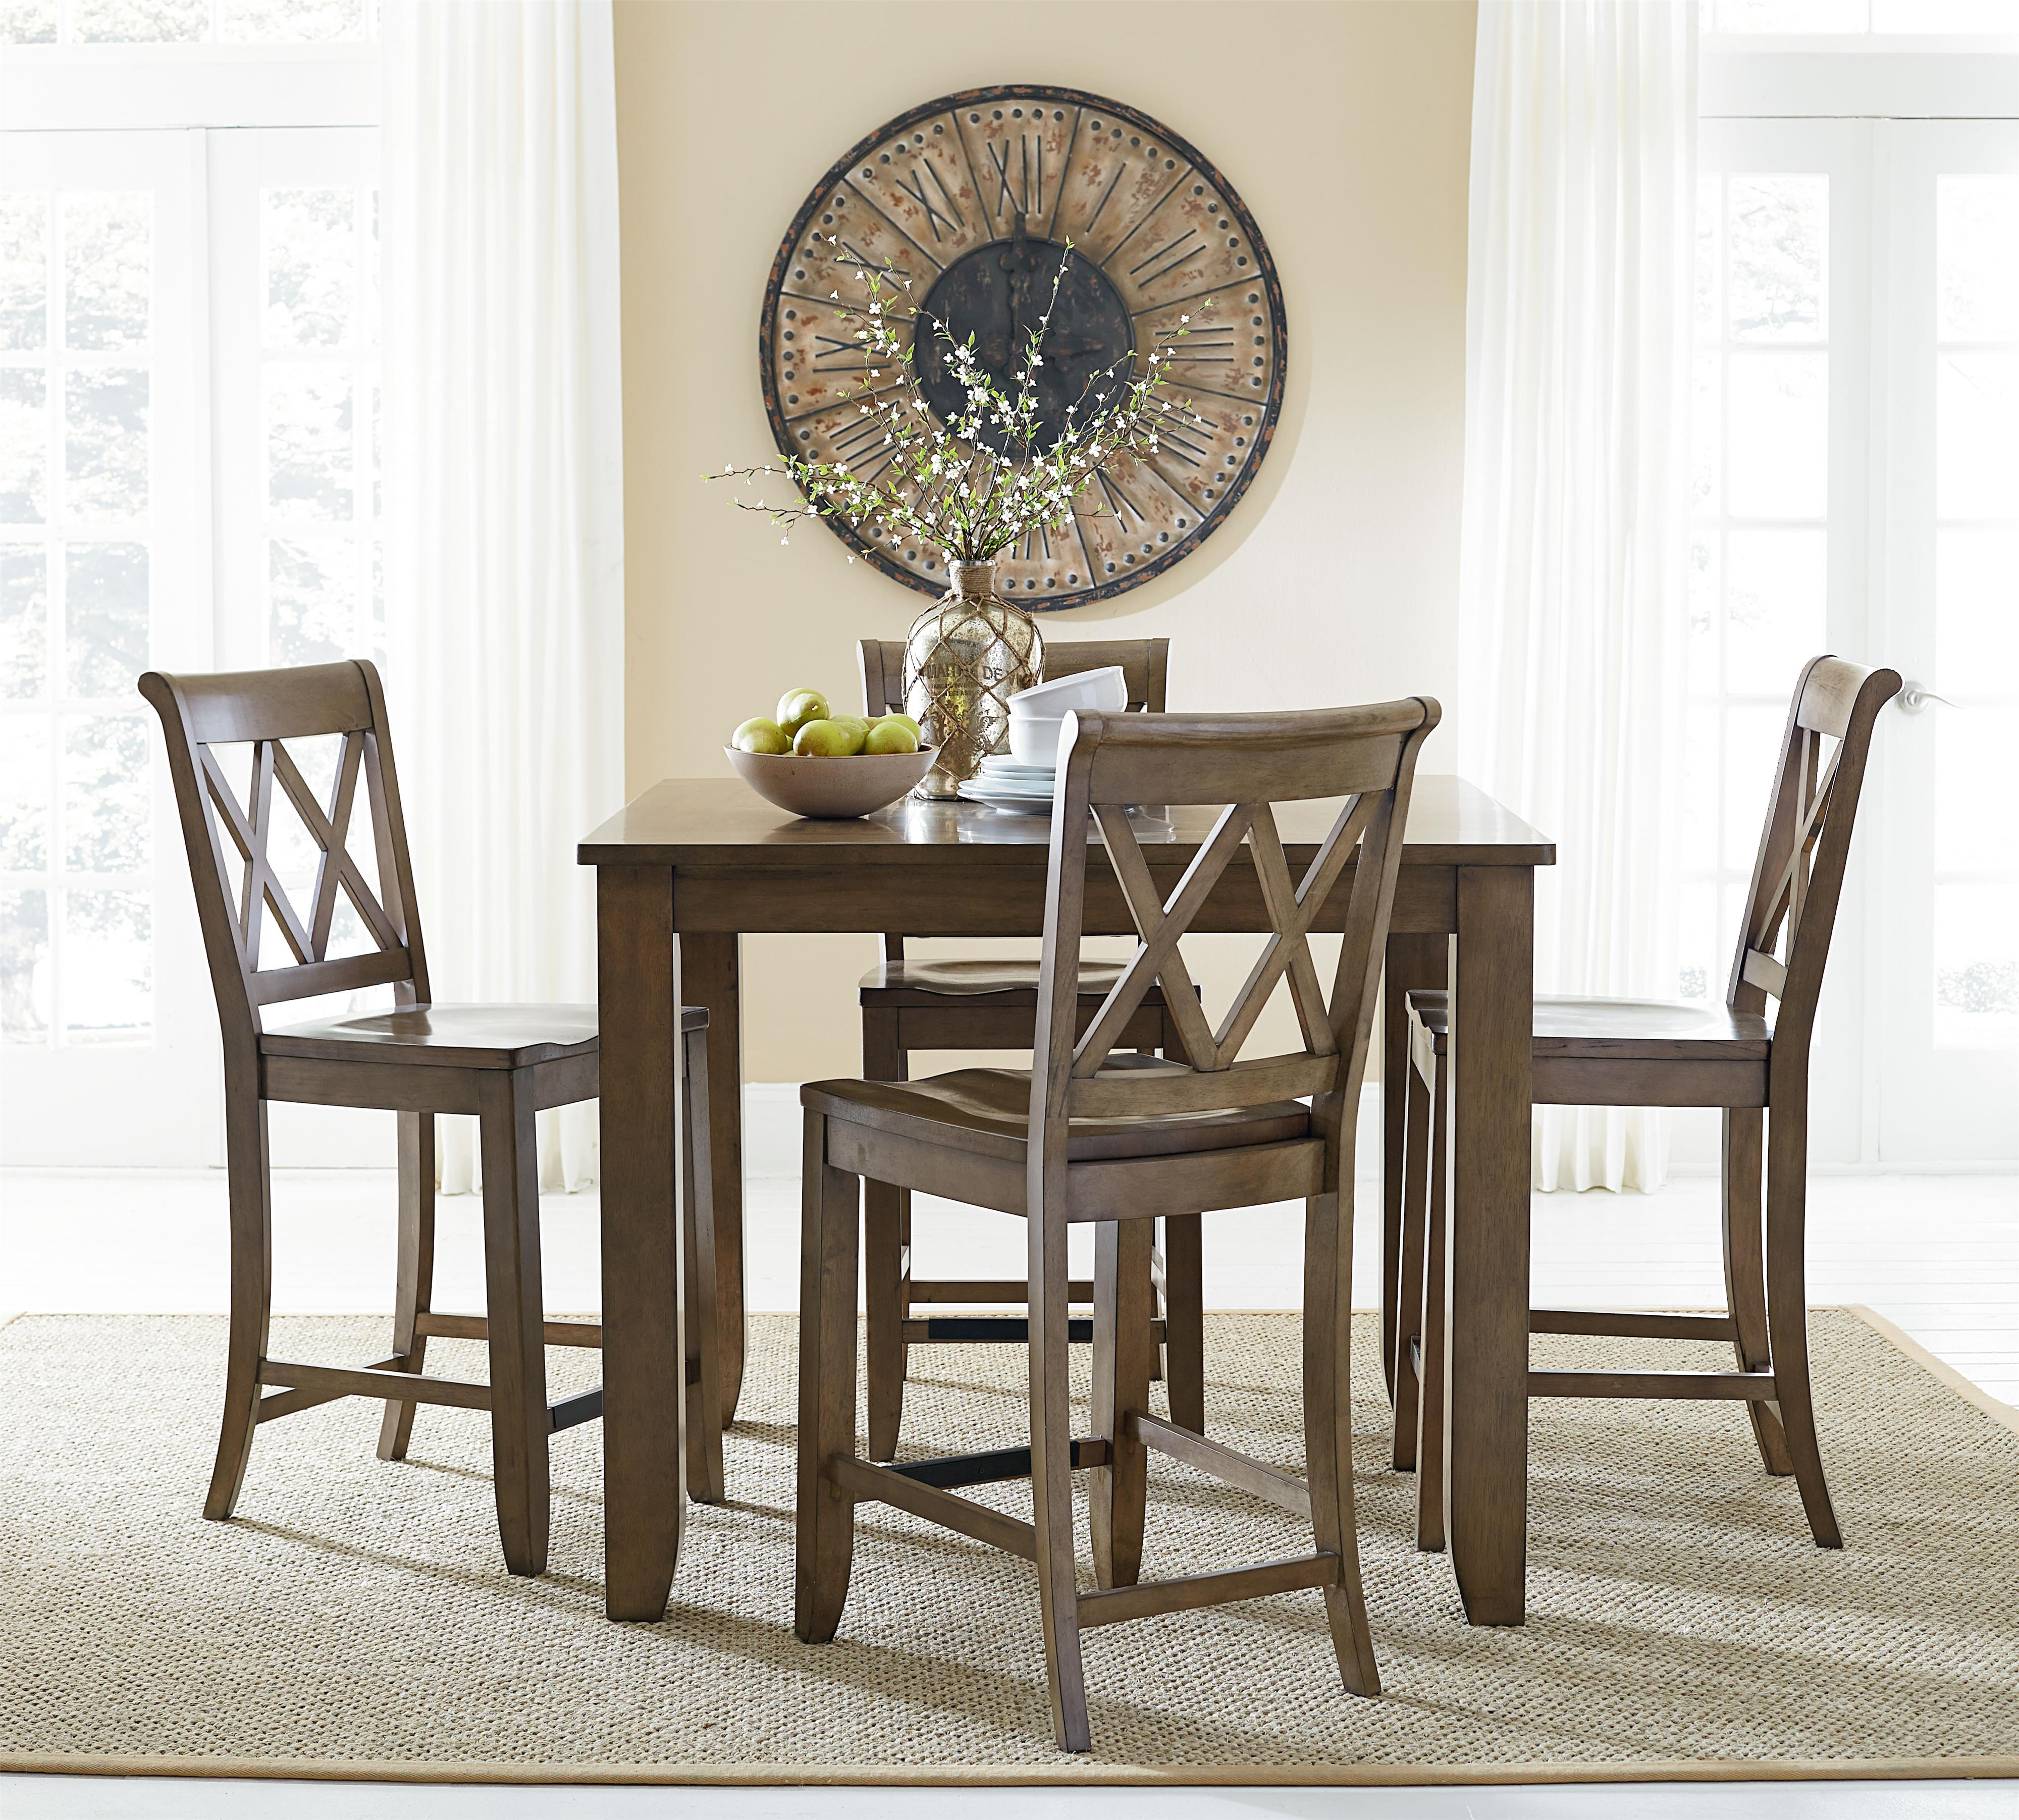 Standard Furniture Vintage Counter Height Dining Set   Item Number:  11326+4x27